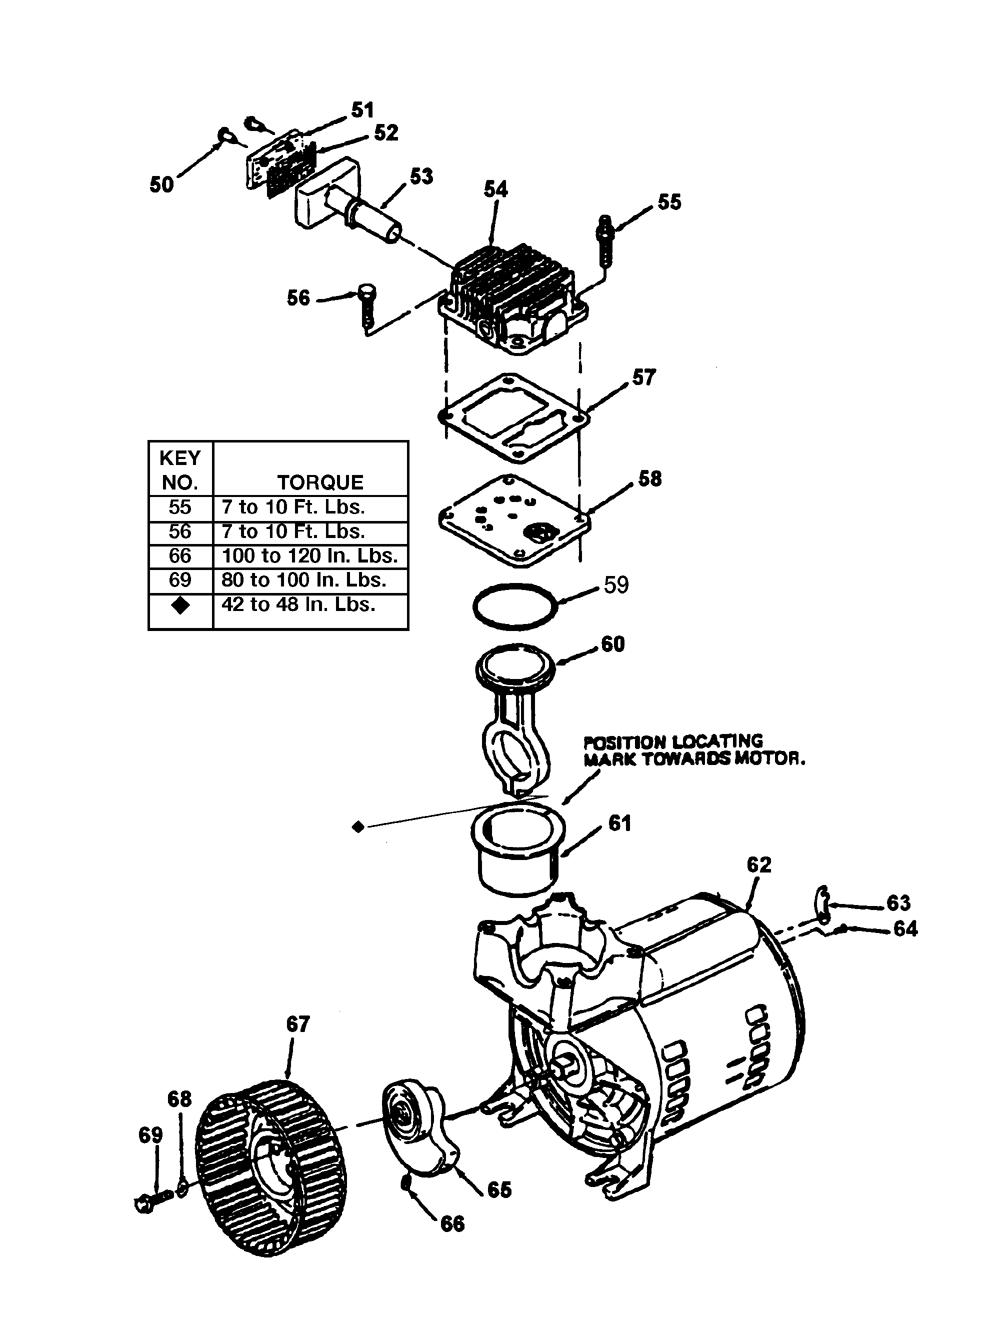 PAF430-Devilbiss-T0-PB-1Break Down